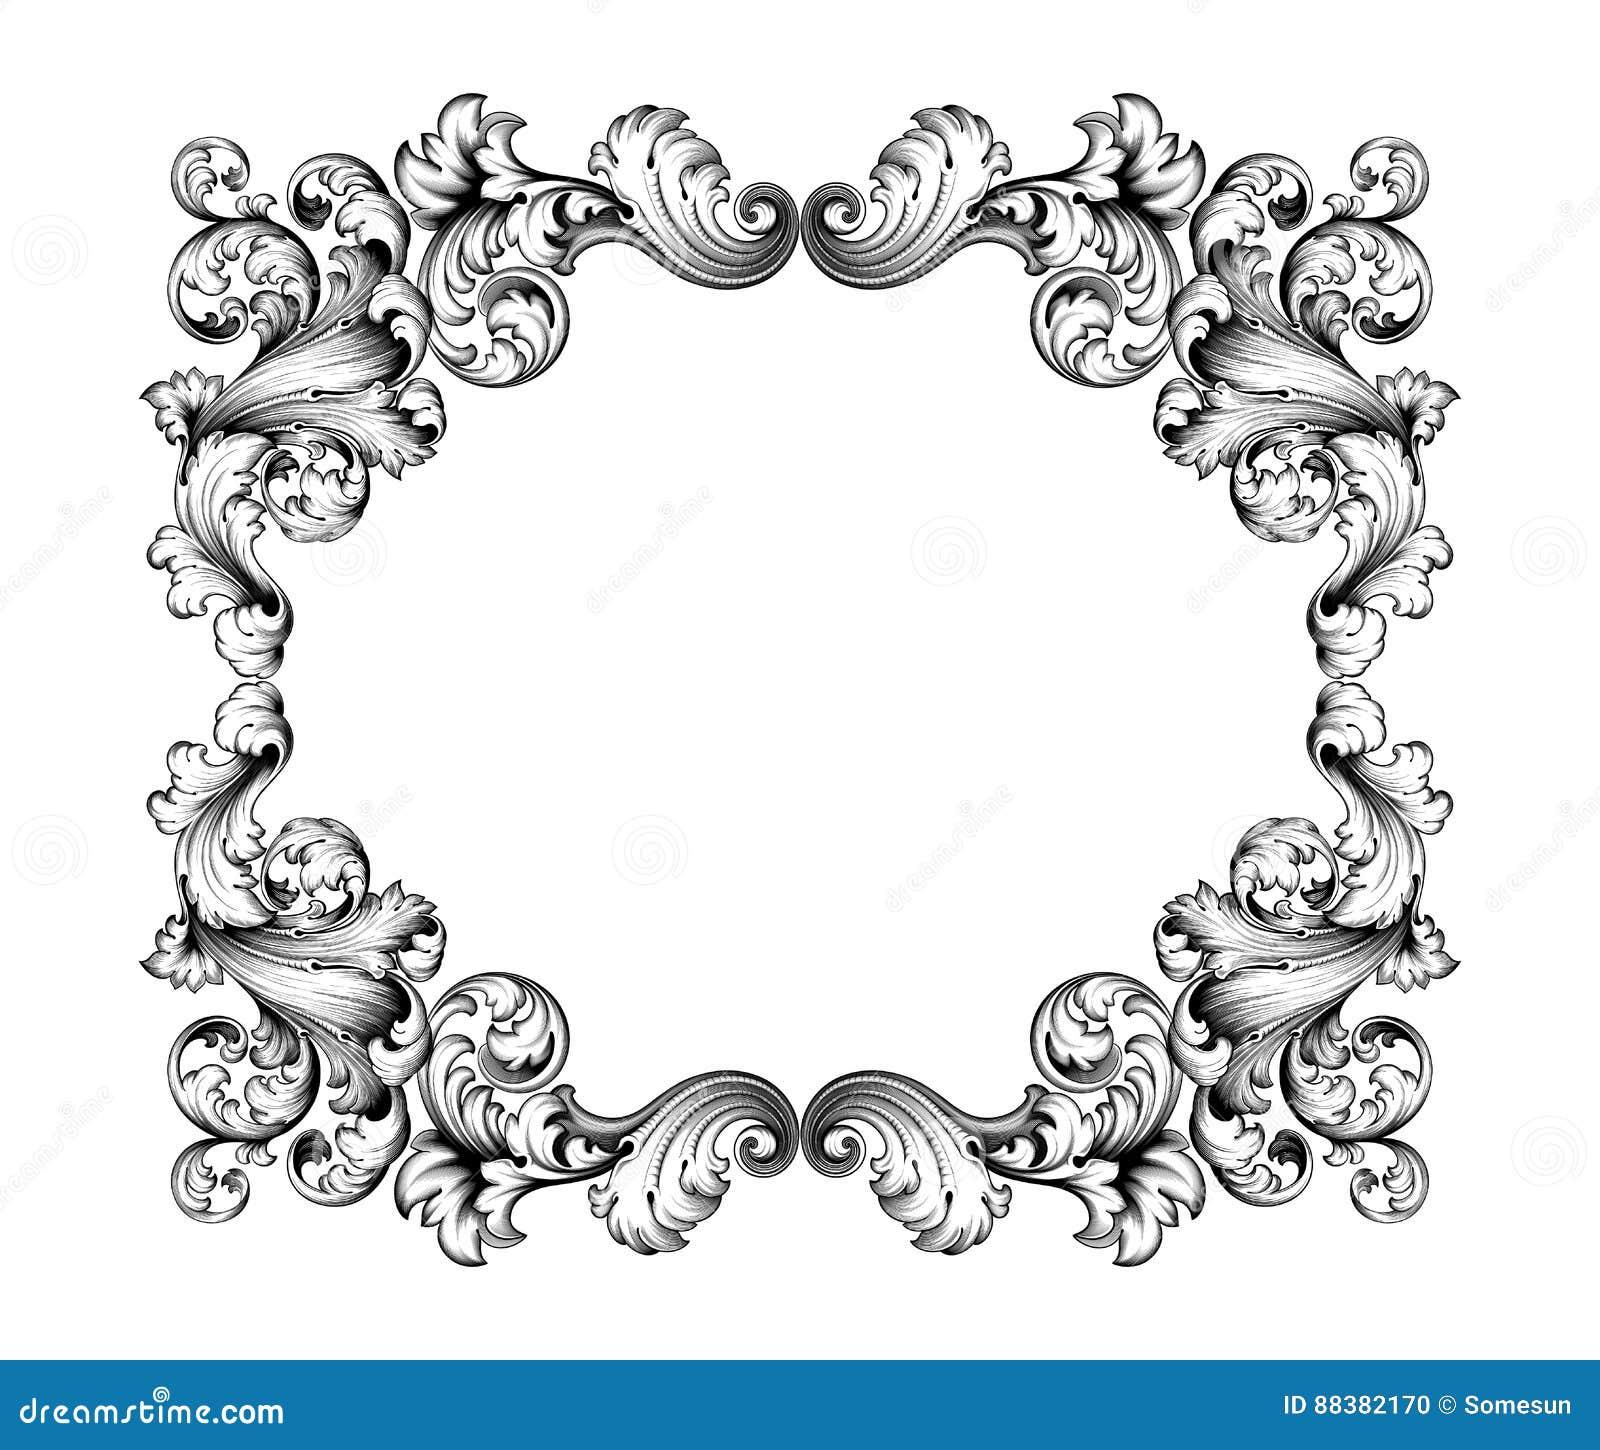 vintage baroque victorian frame border monogram floral ornament scroll engraved retro pattern tattoo calligraphic - Engraved Frame